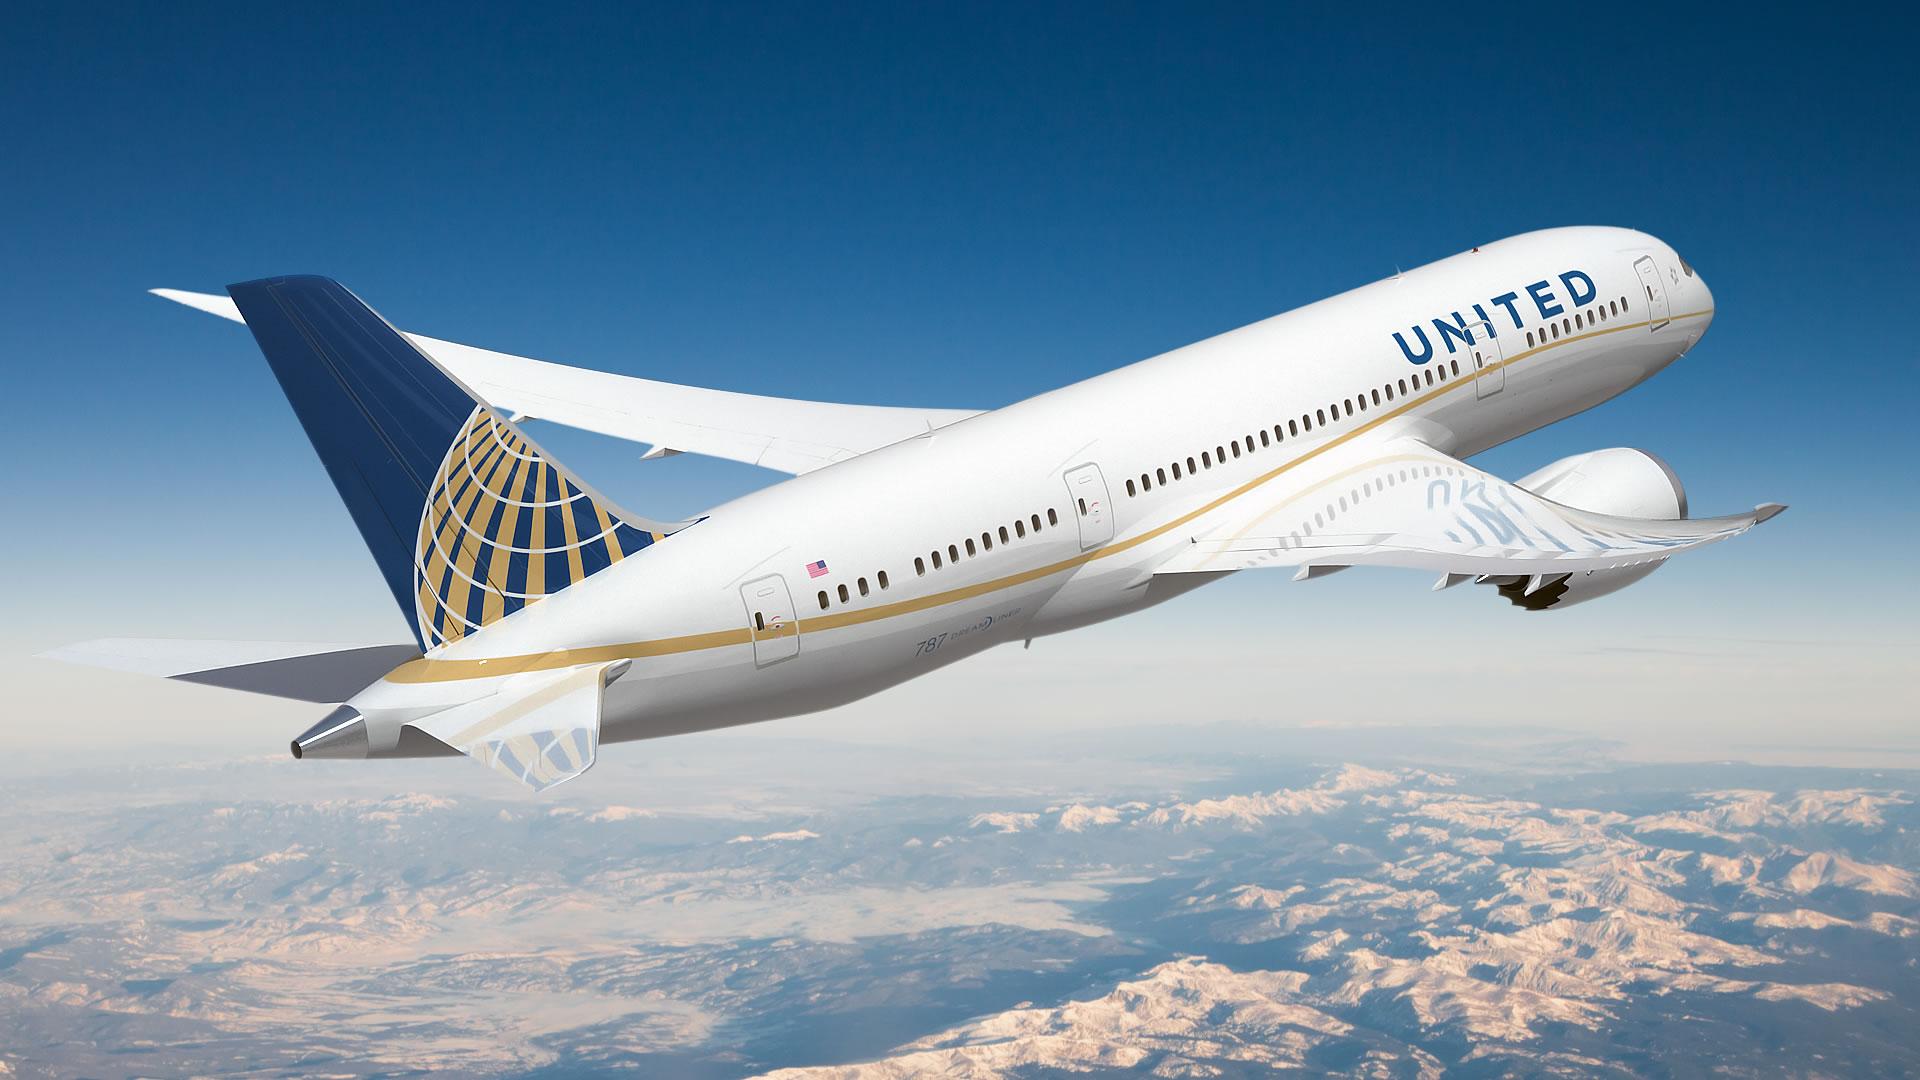 United airplane photo